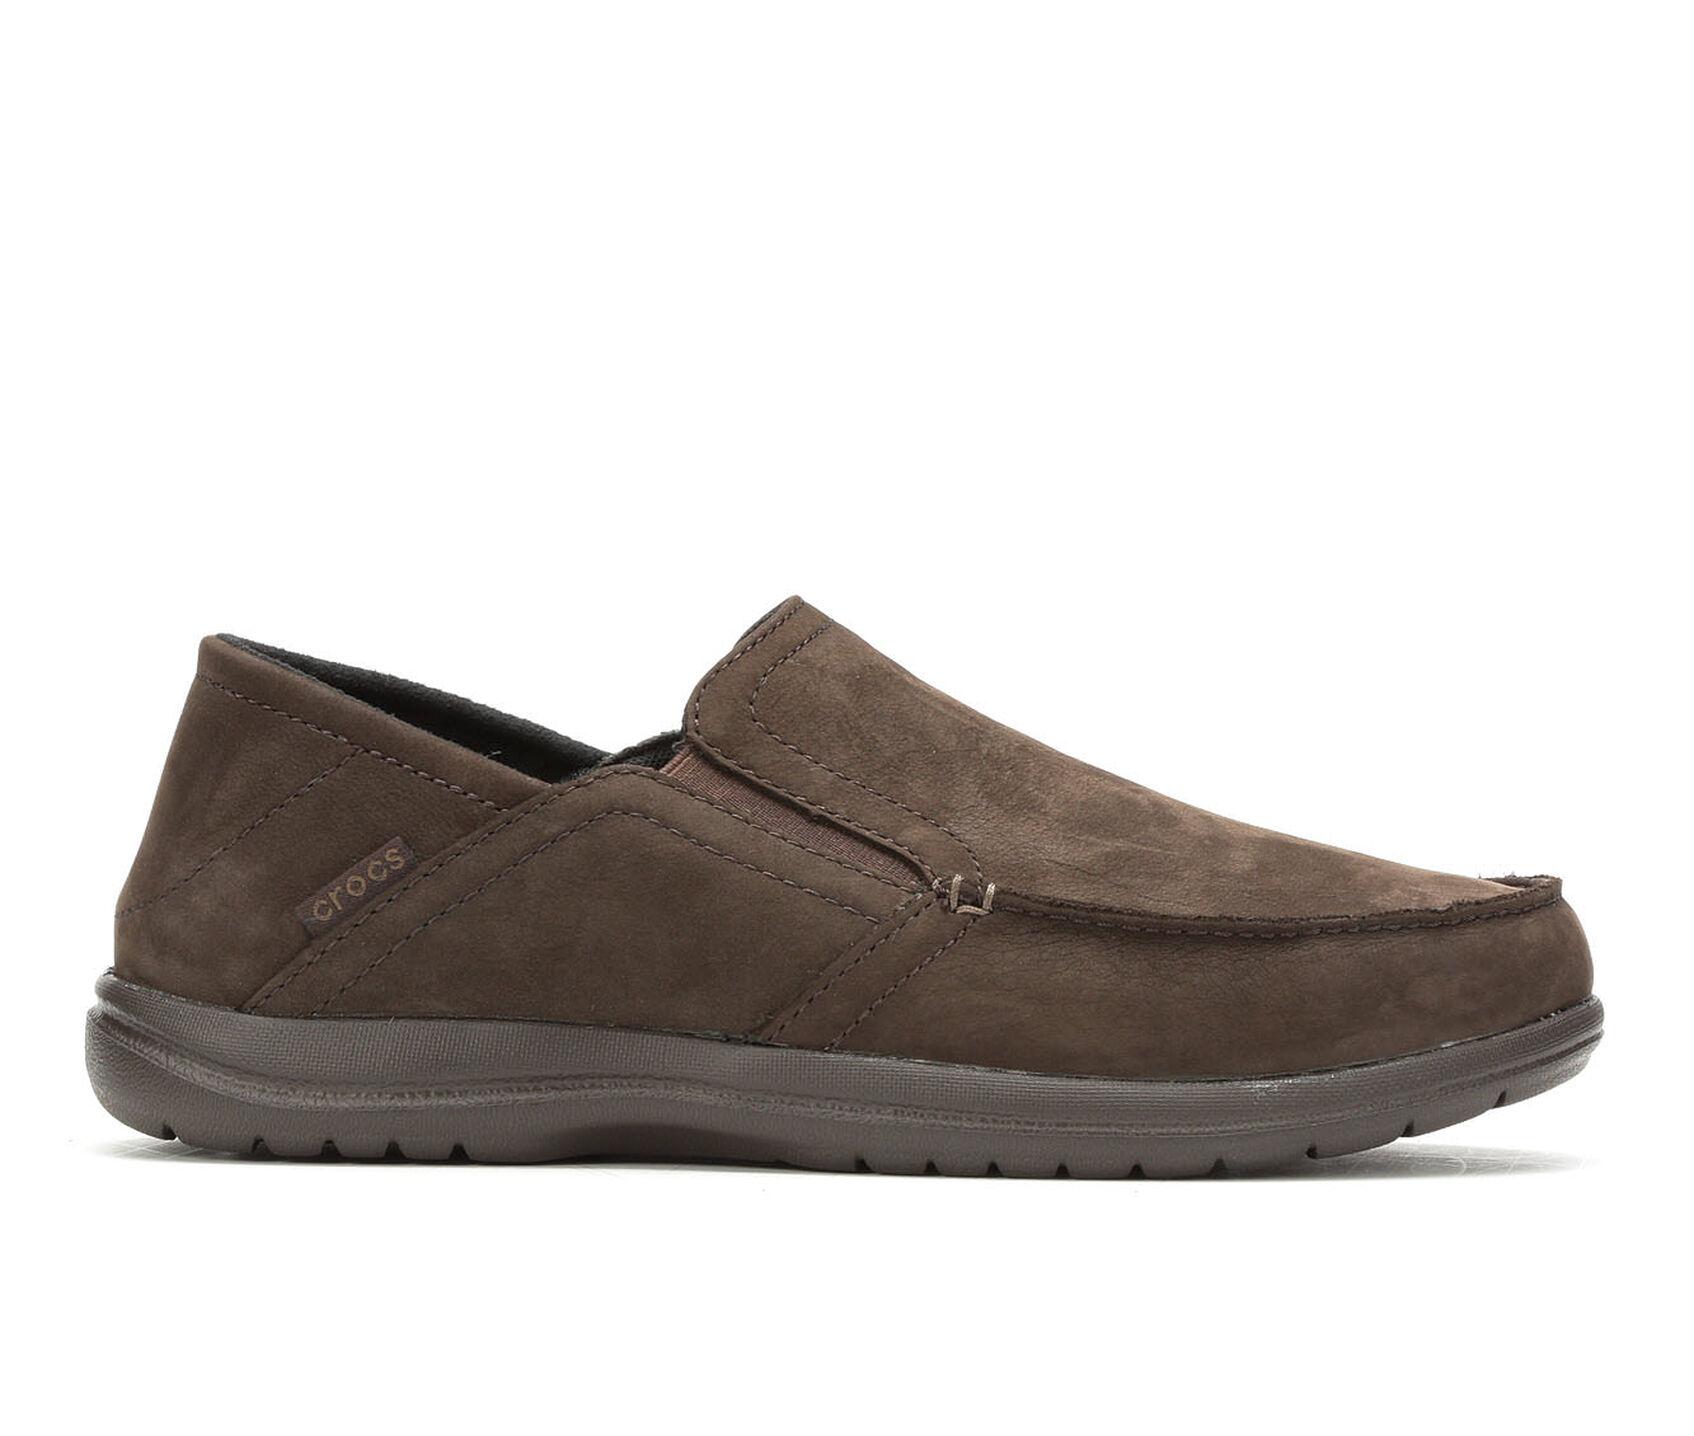 b9a742ffeeb22 Men's Crocs Santa Cruz Convertible Leather Slip On | Shoe Carnival